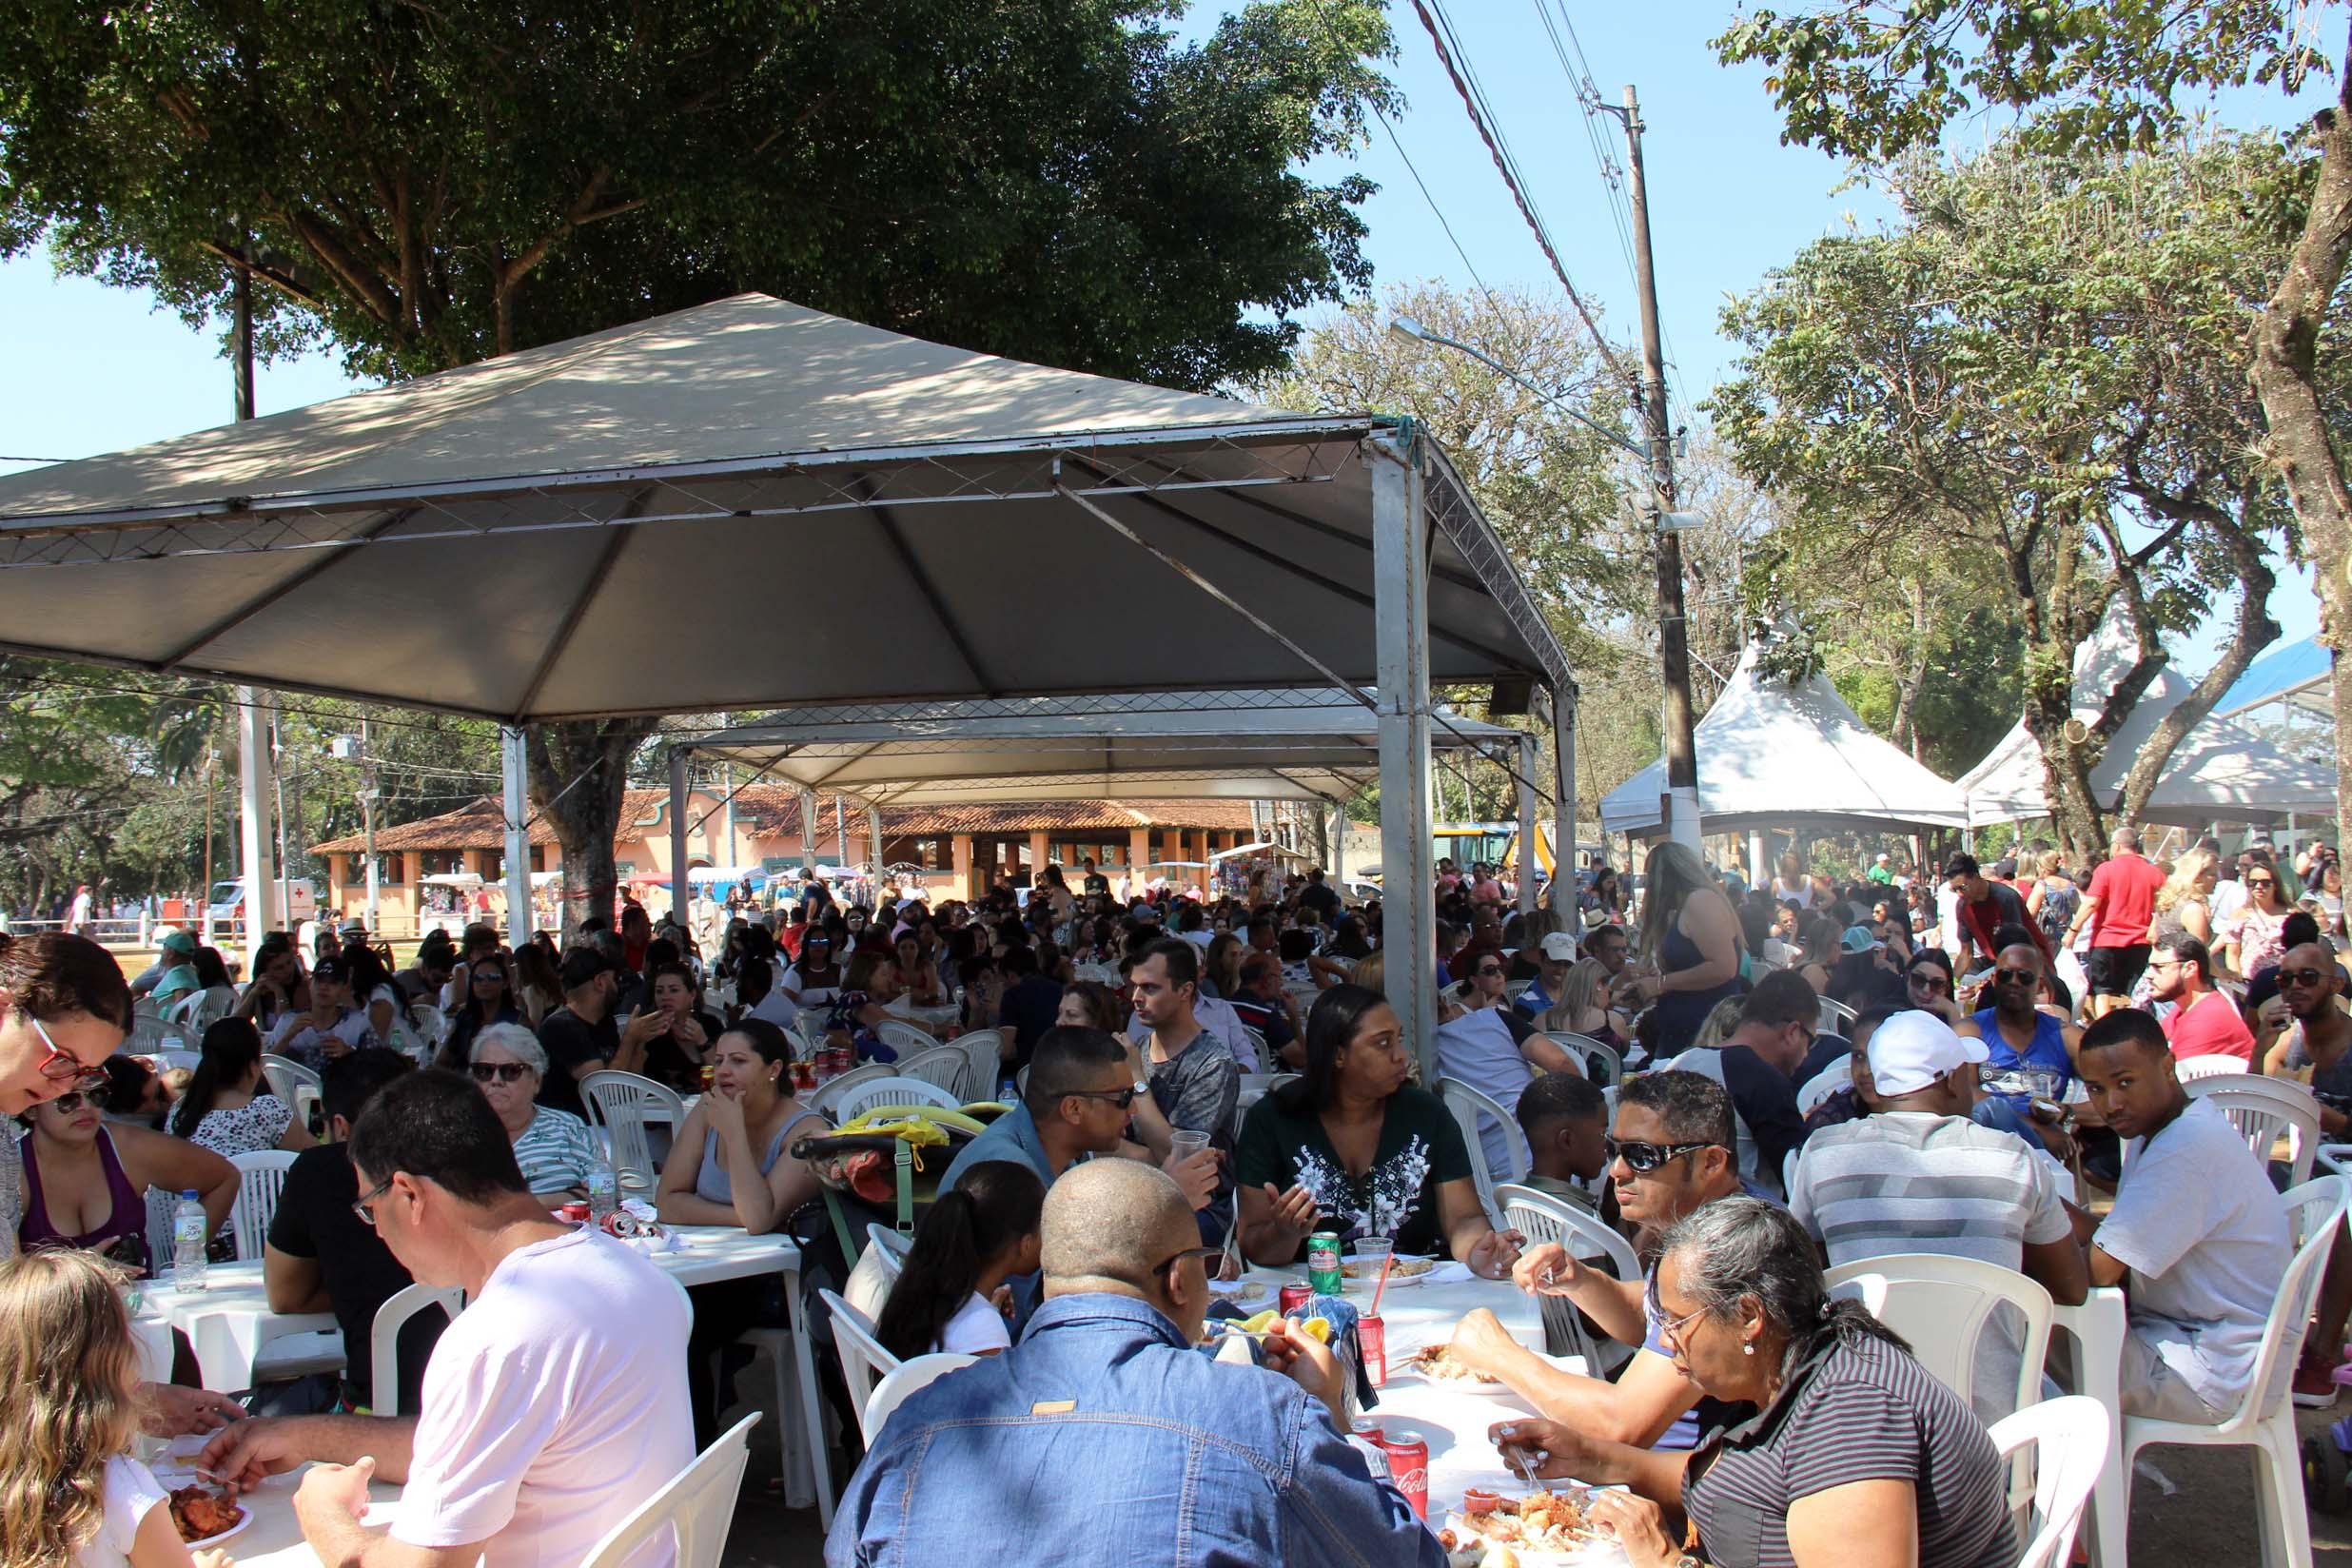 09.09.2018 8º Festival da Linguiça (9)